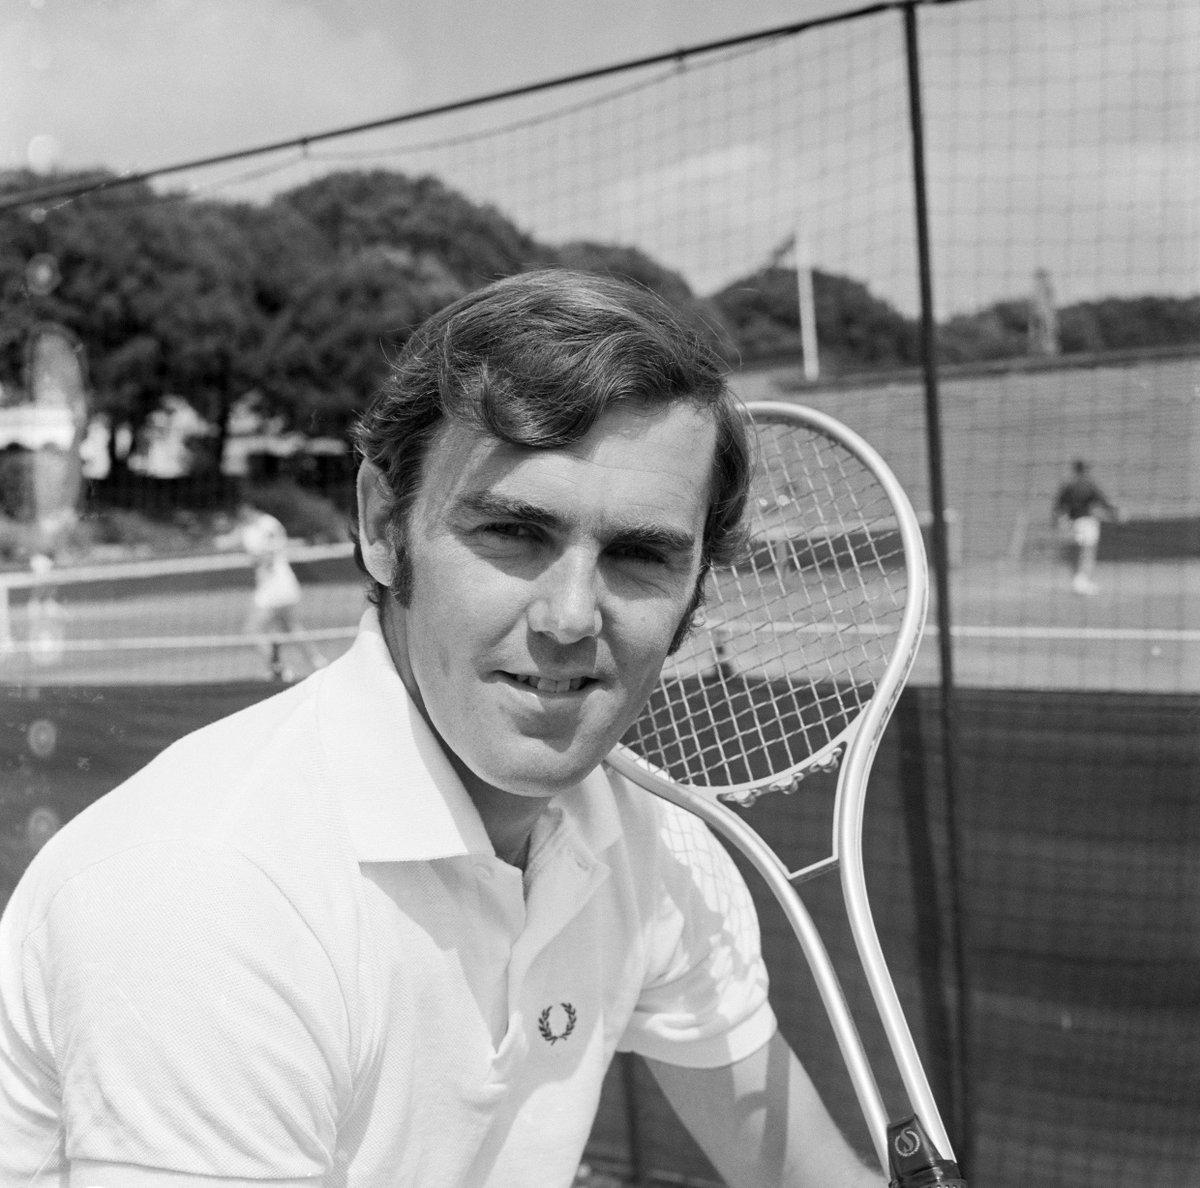 Wimbledon's photo on Paul Hutchins